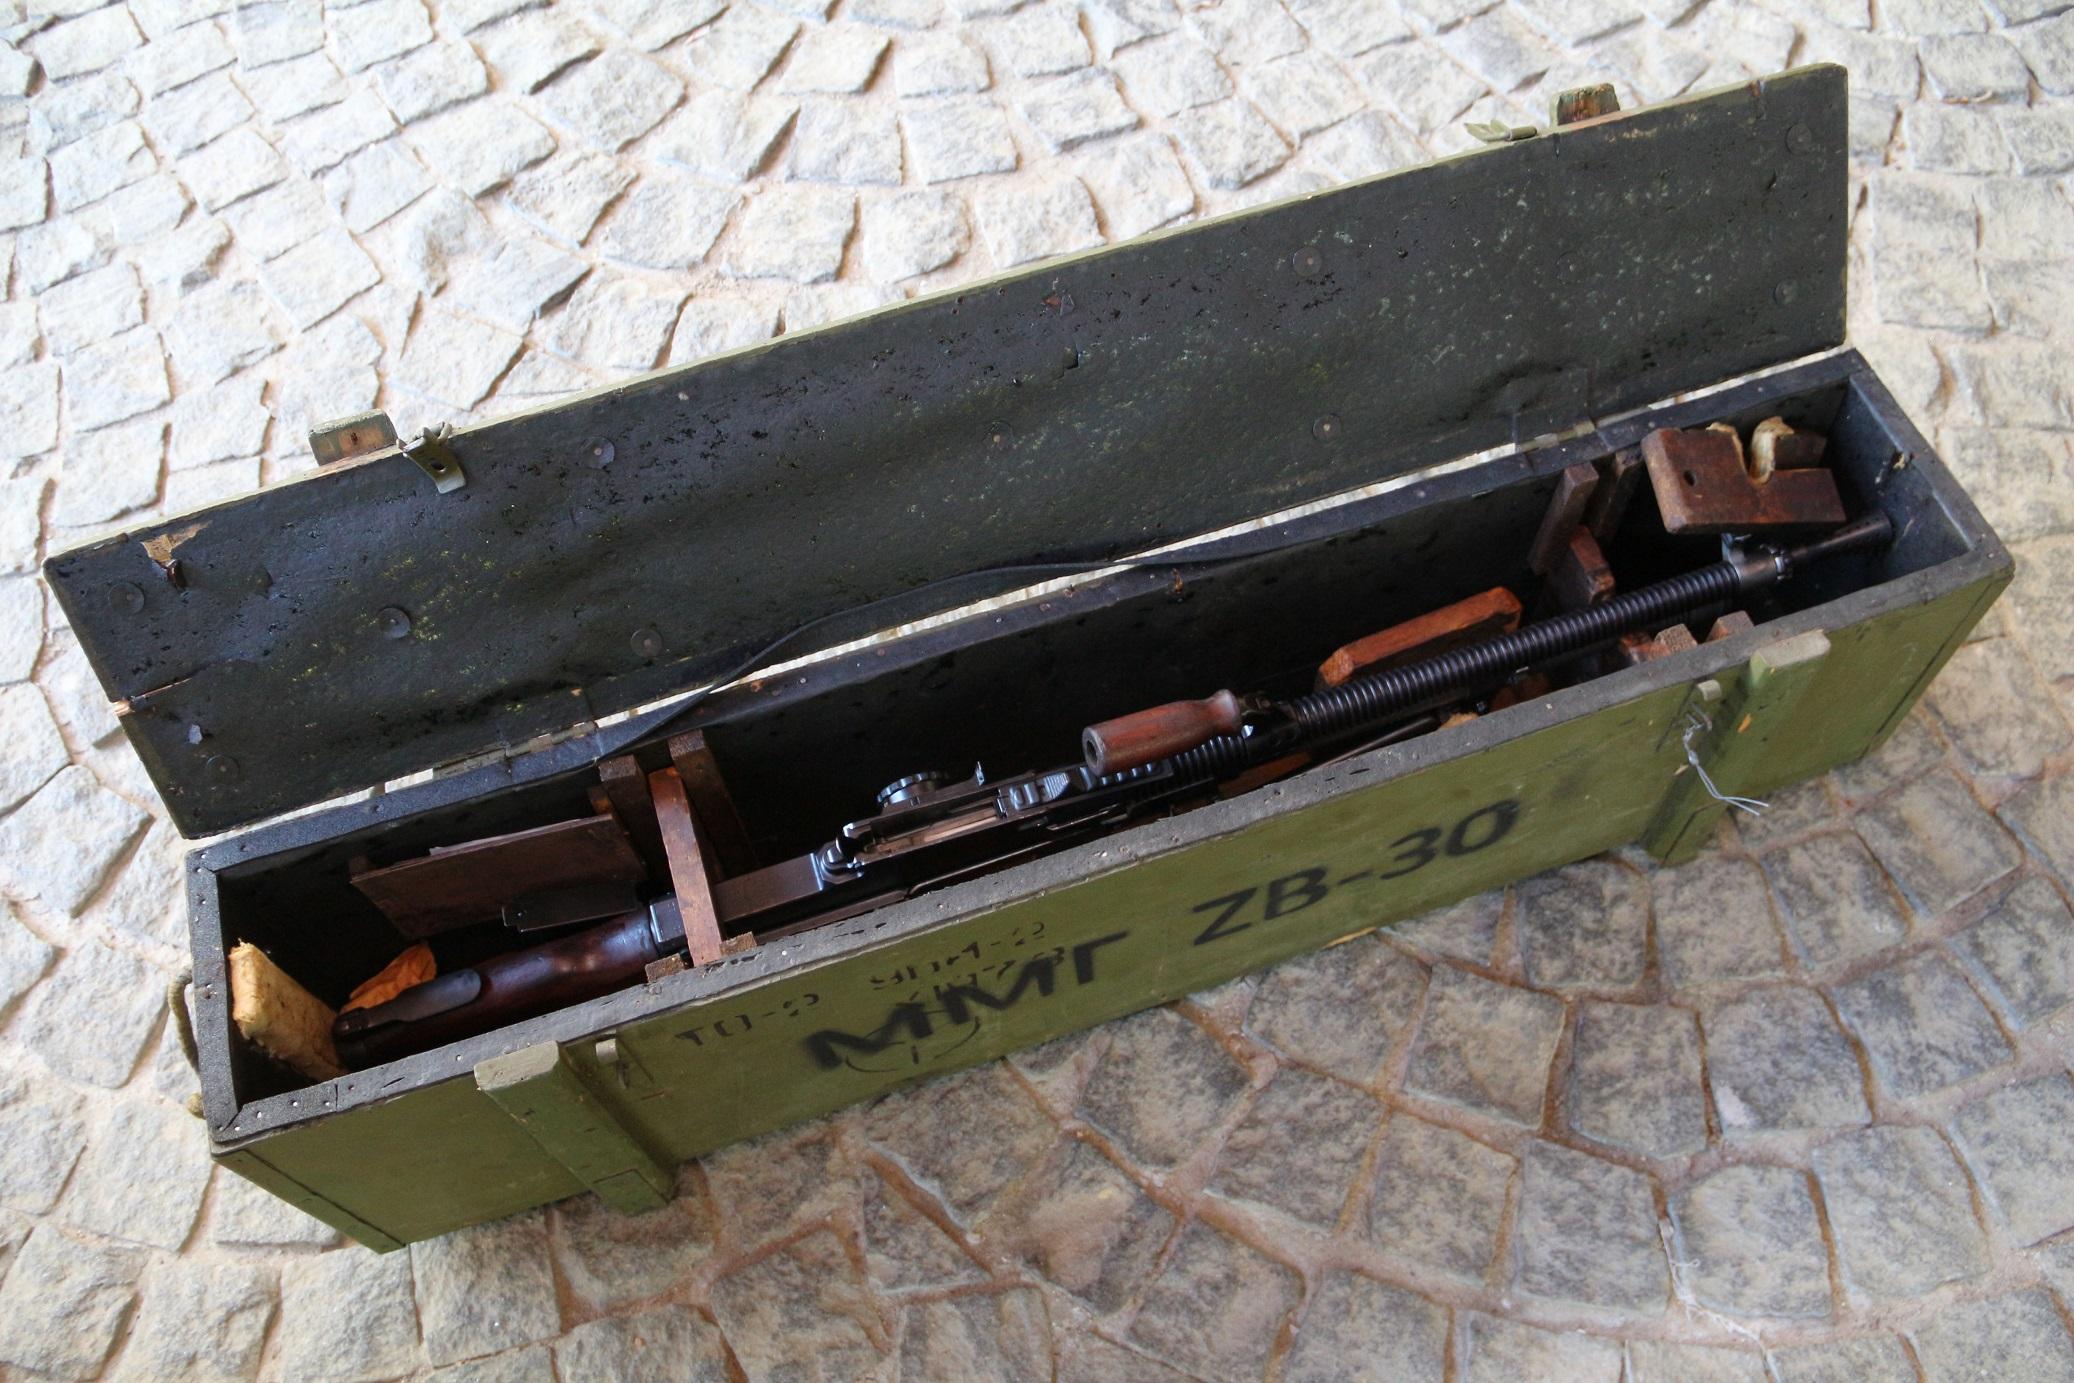 Ручной пулемет ZB vz. 30 Zbrojovka Brno #02133Br, румынский заказ с гербом, трофей